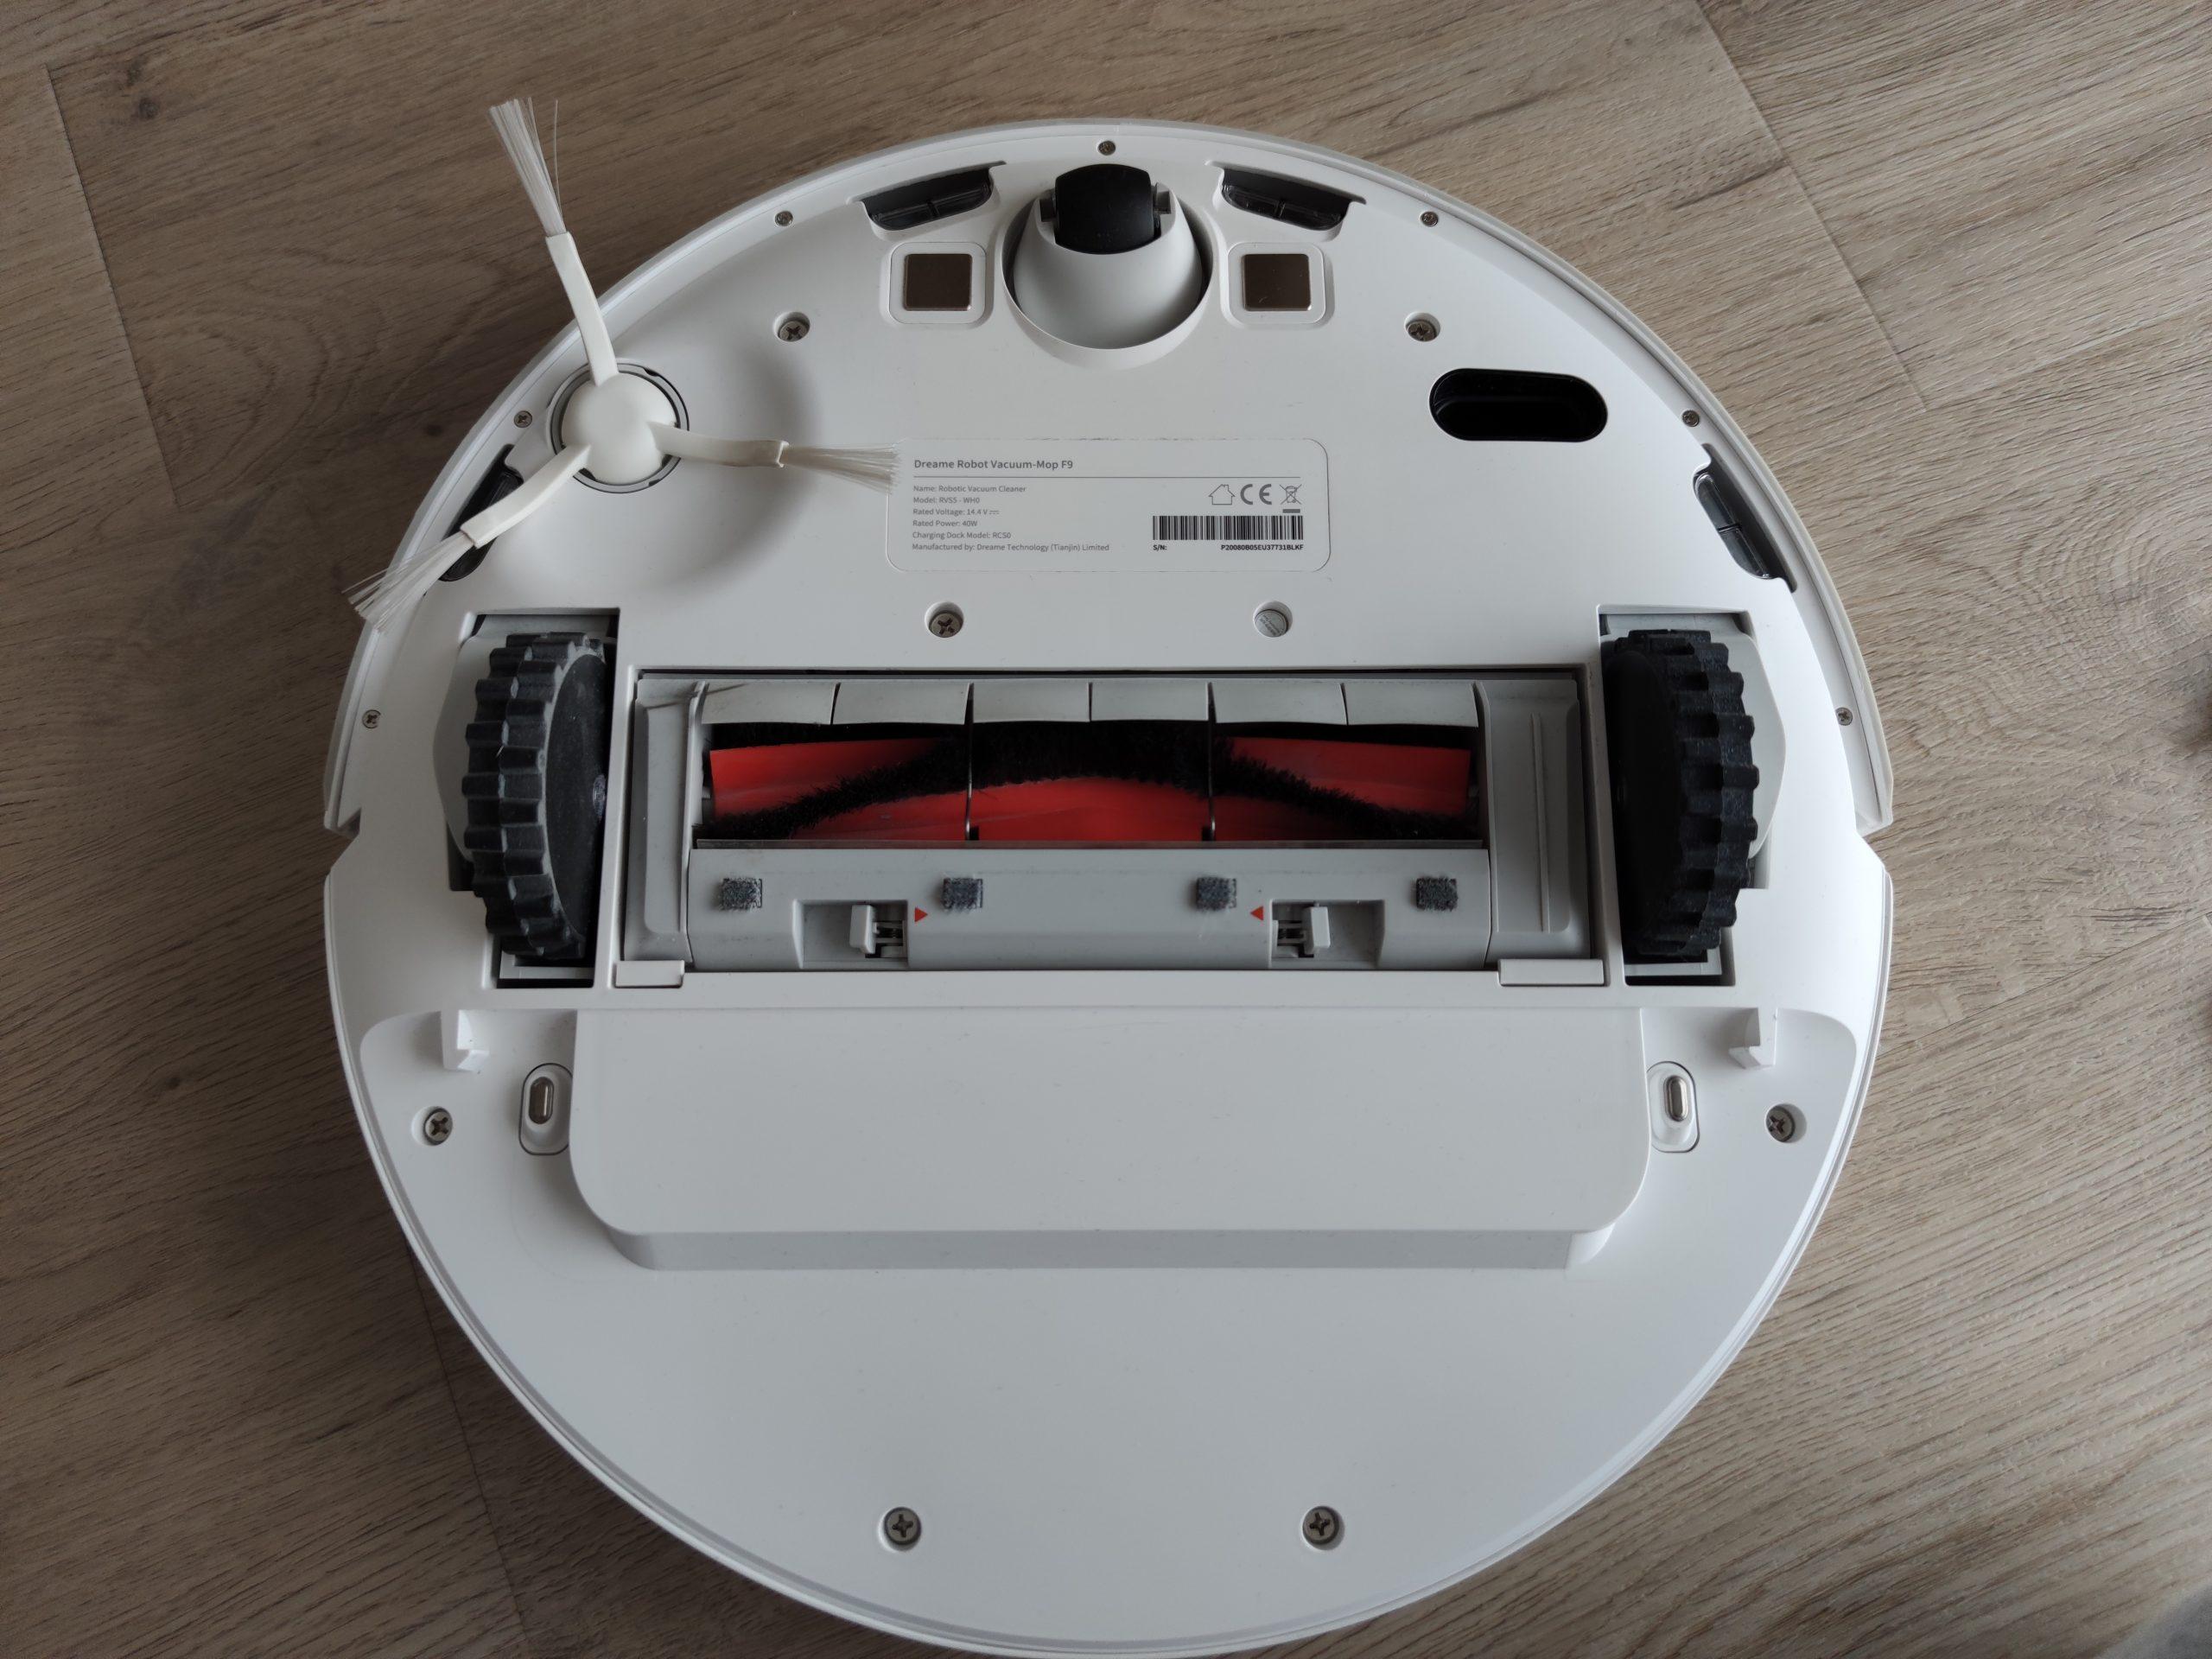 Dreame F9 Saugroboter Unterseite